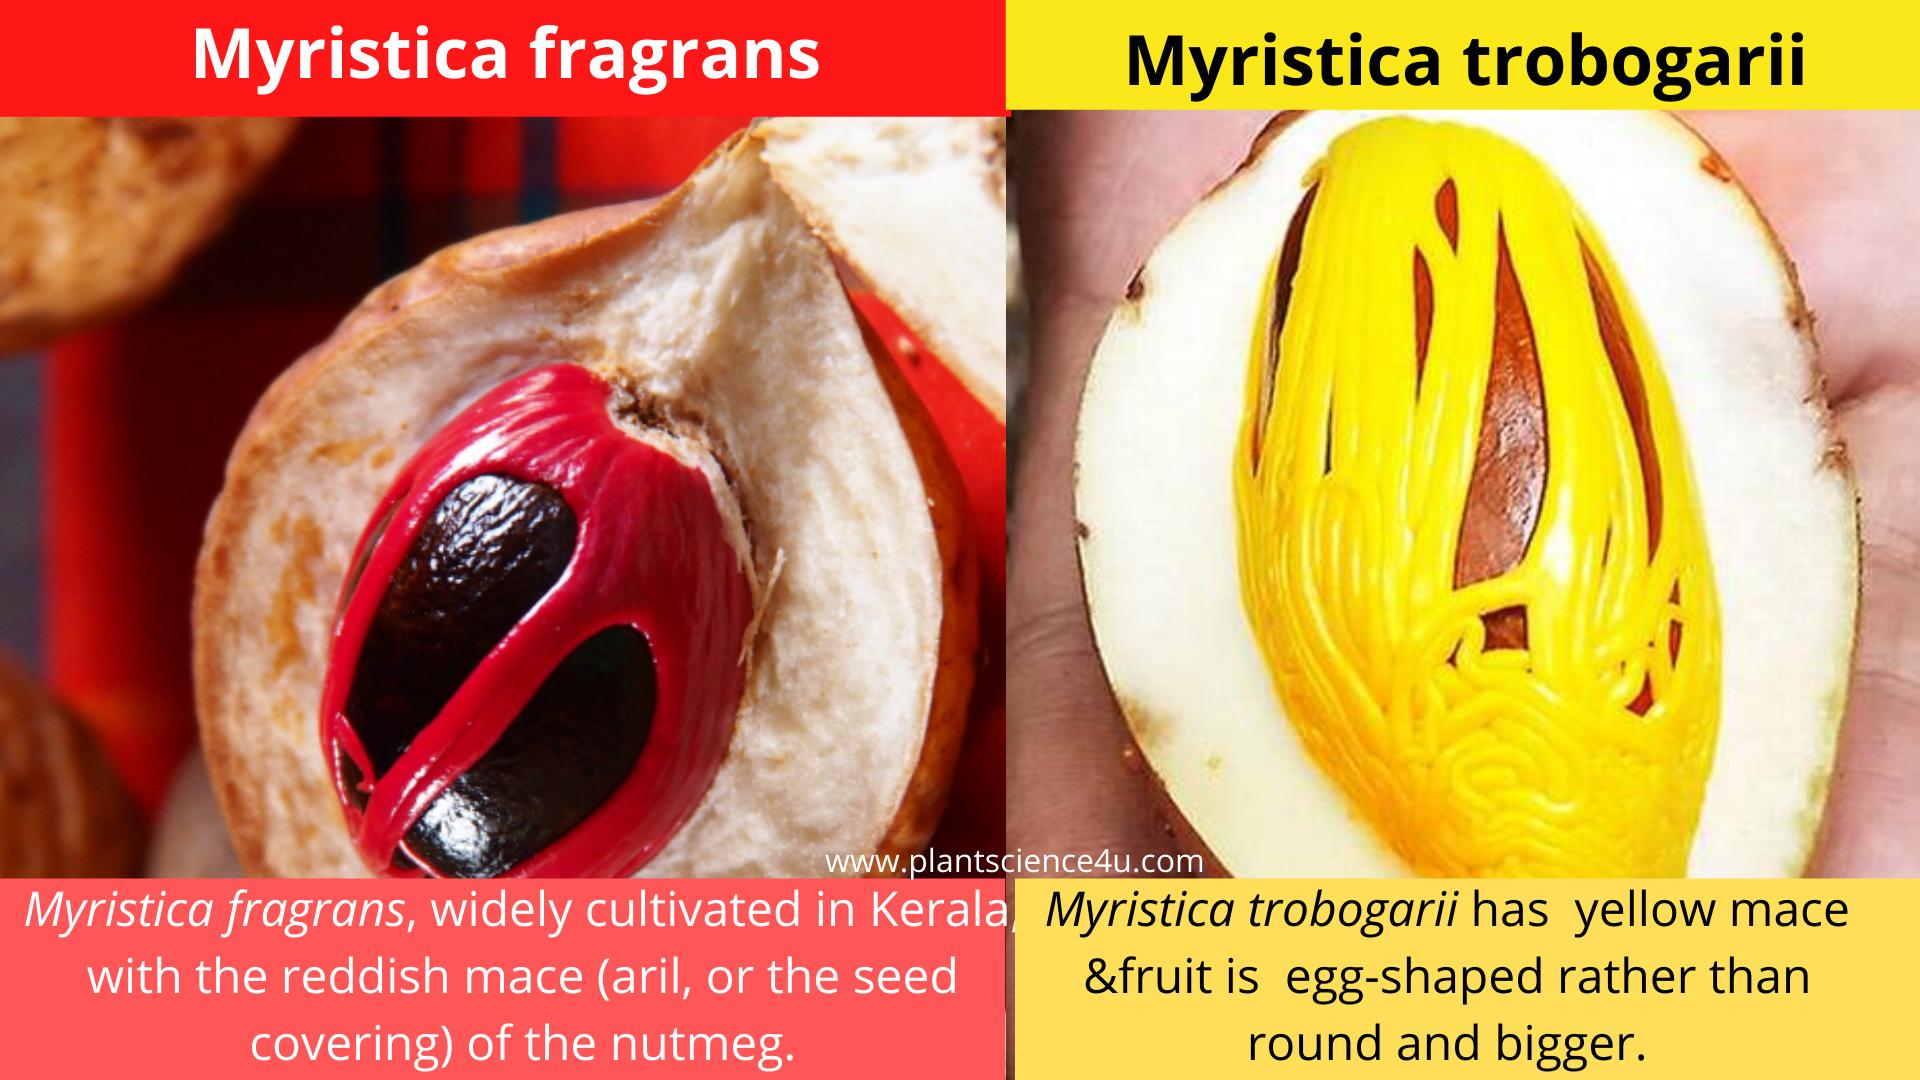 Yellow mace Nutmeg (Myristica trobogarii)